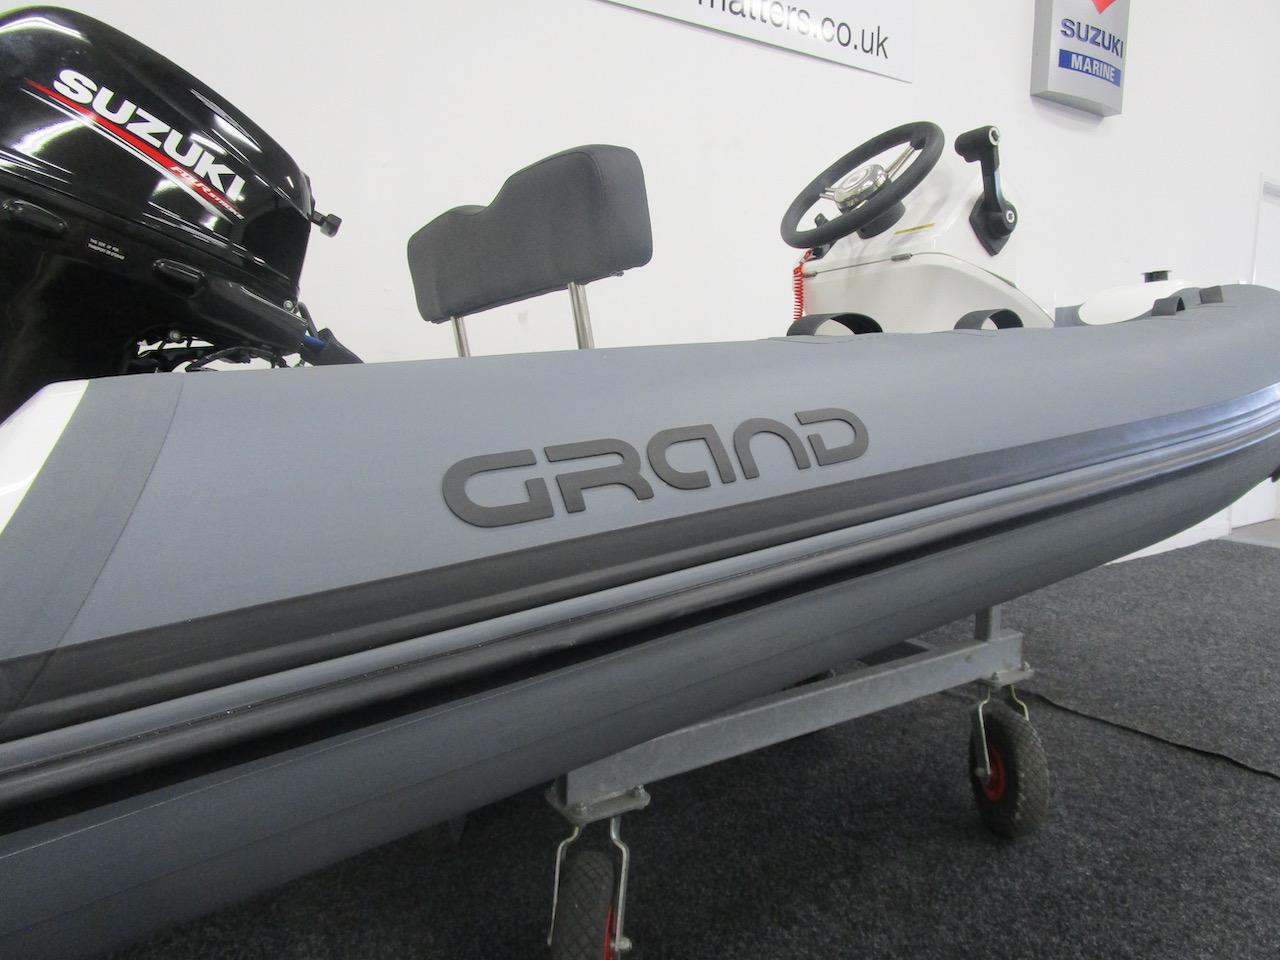 GRAND S330 RIB tender tube